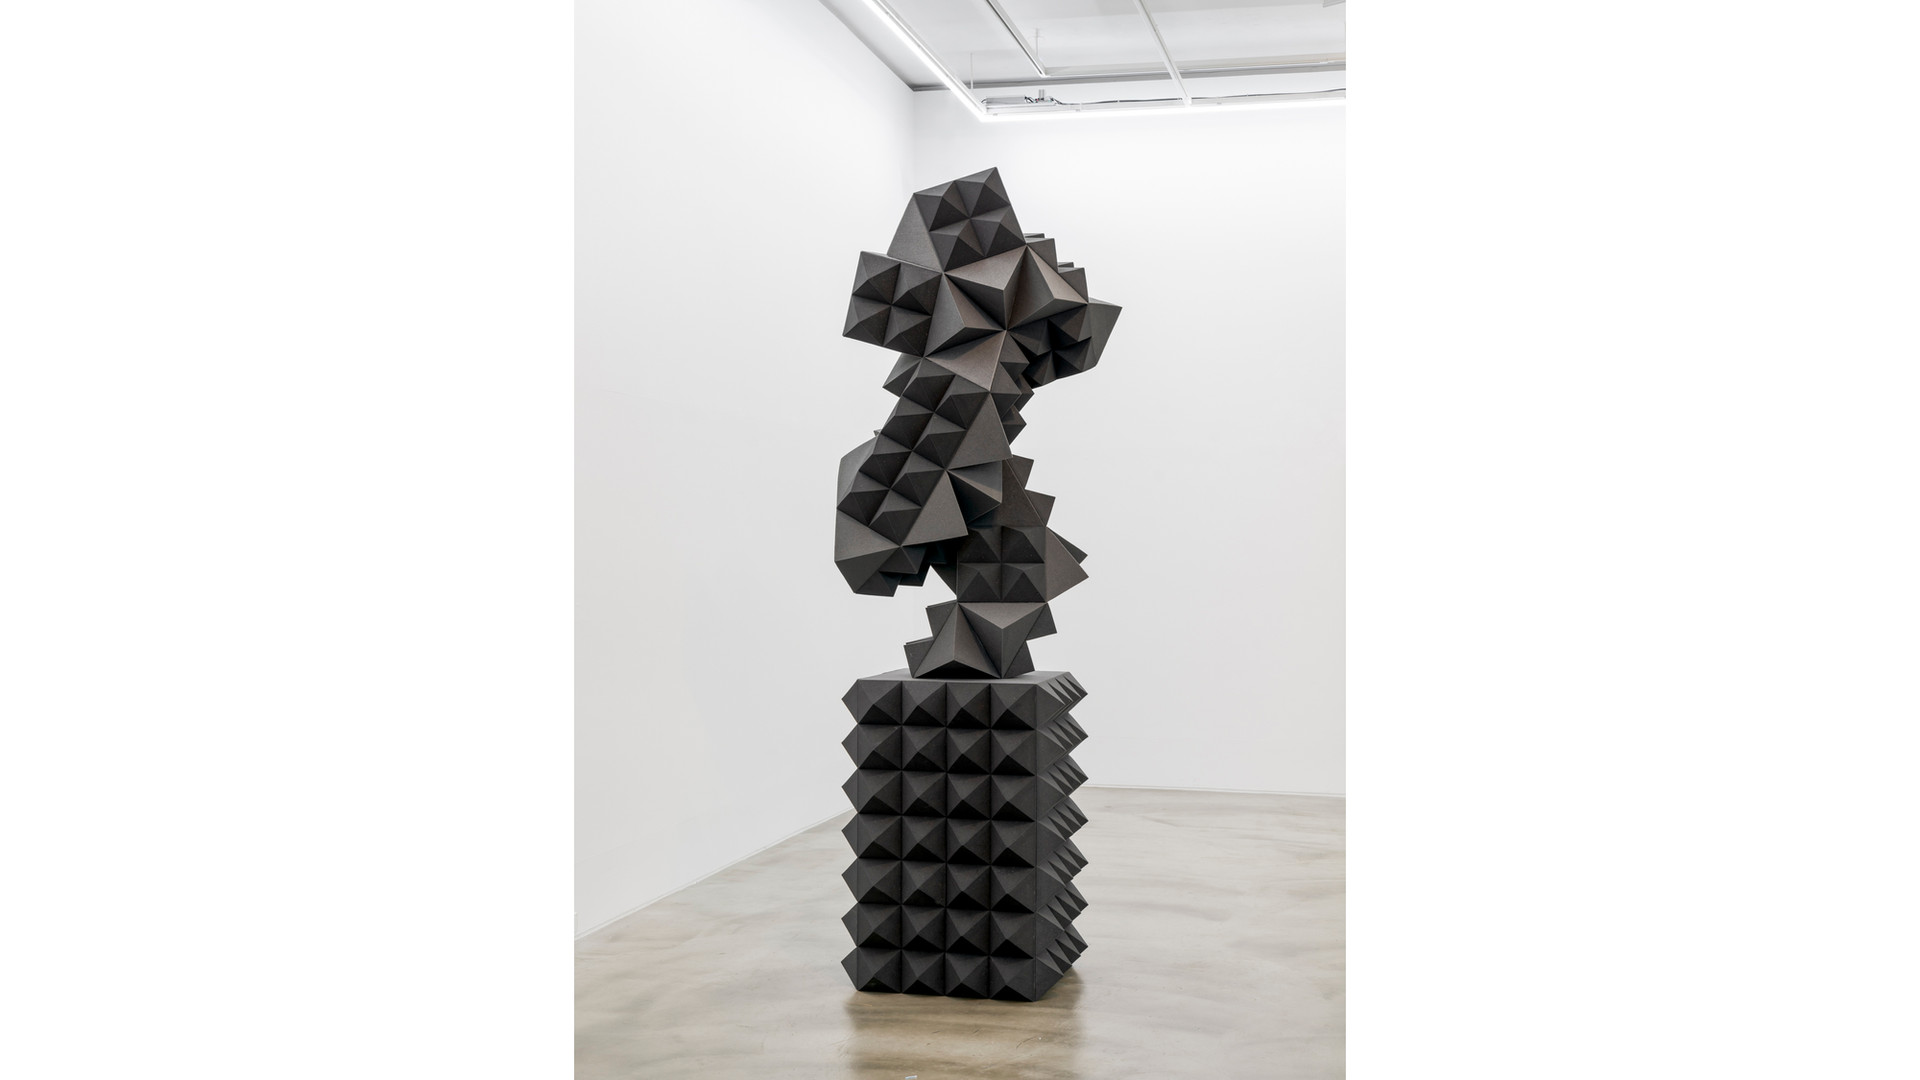 Silent Memorial-III, 2021, Sponge, Wood, Styrofoam, 270 x 85 x 85cm